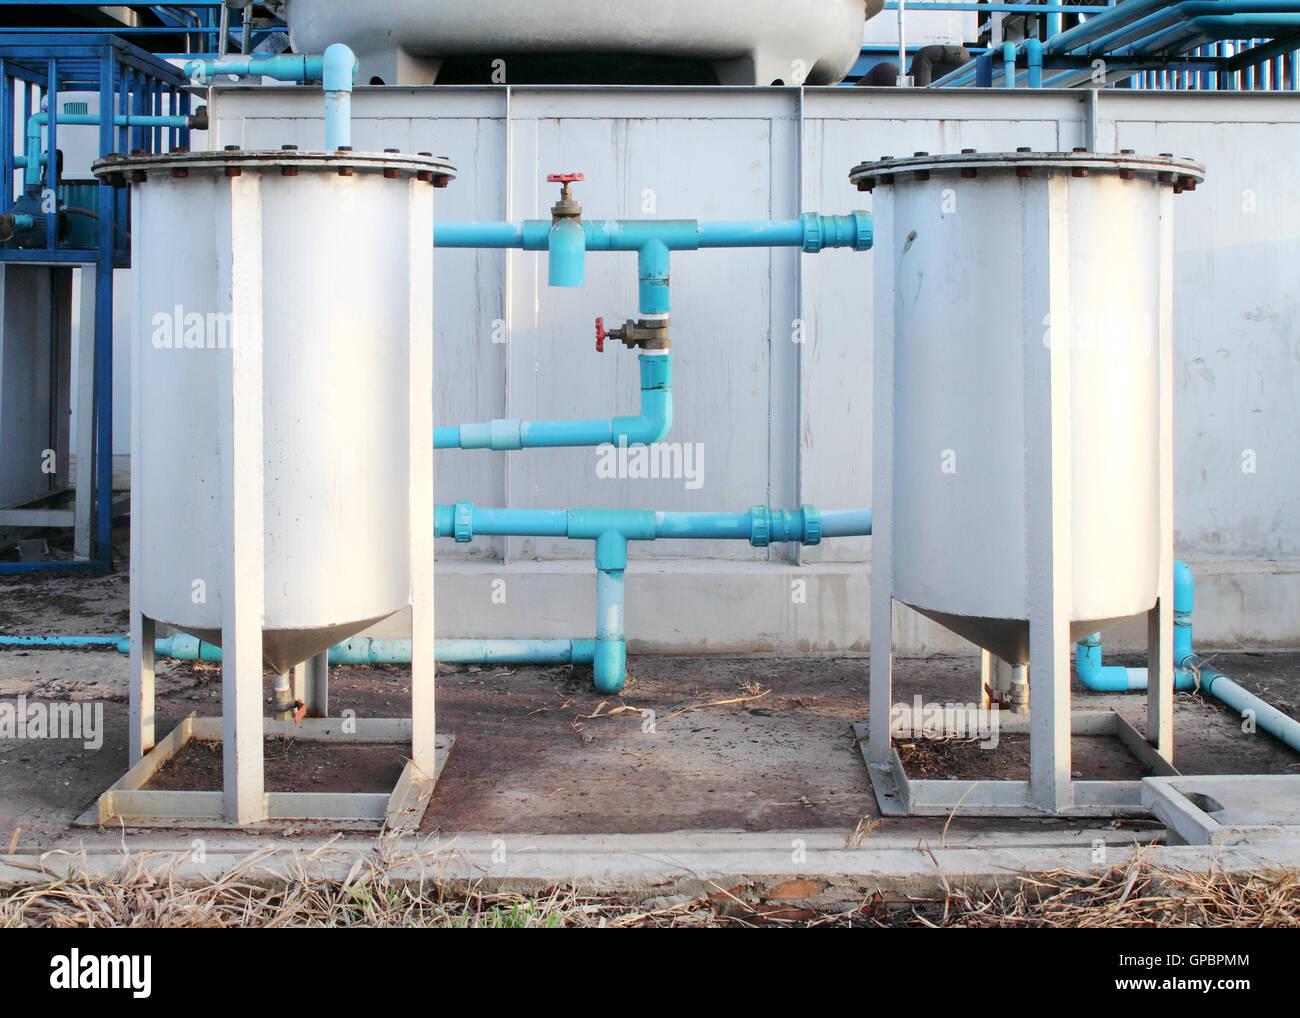 Water Storage Tank Stock Photos & Water Storage Tank Stock Images ...